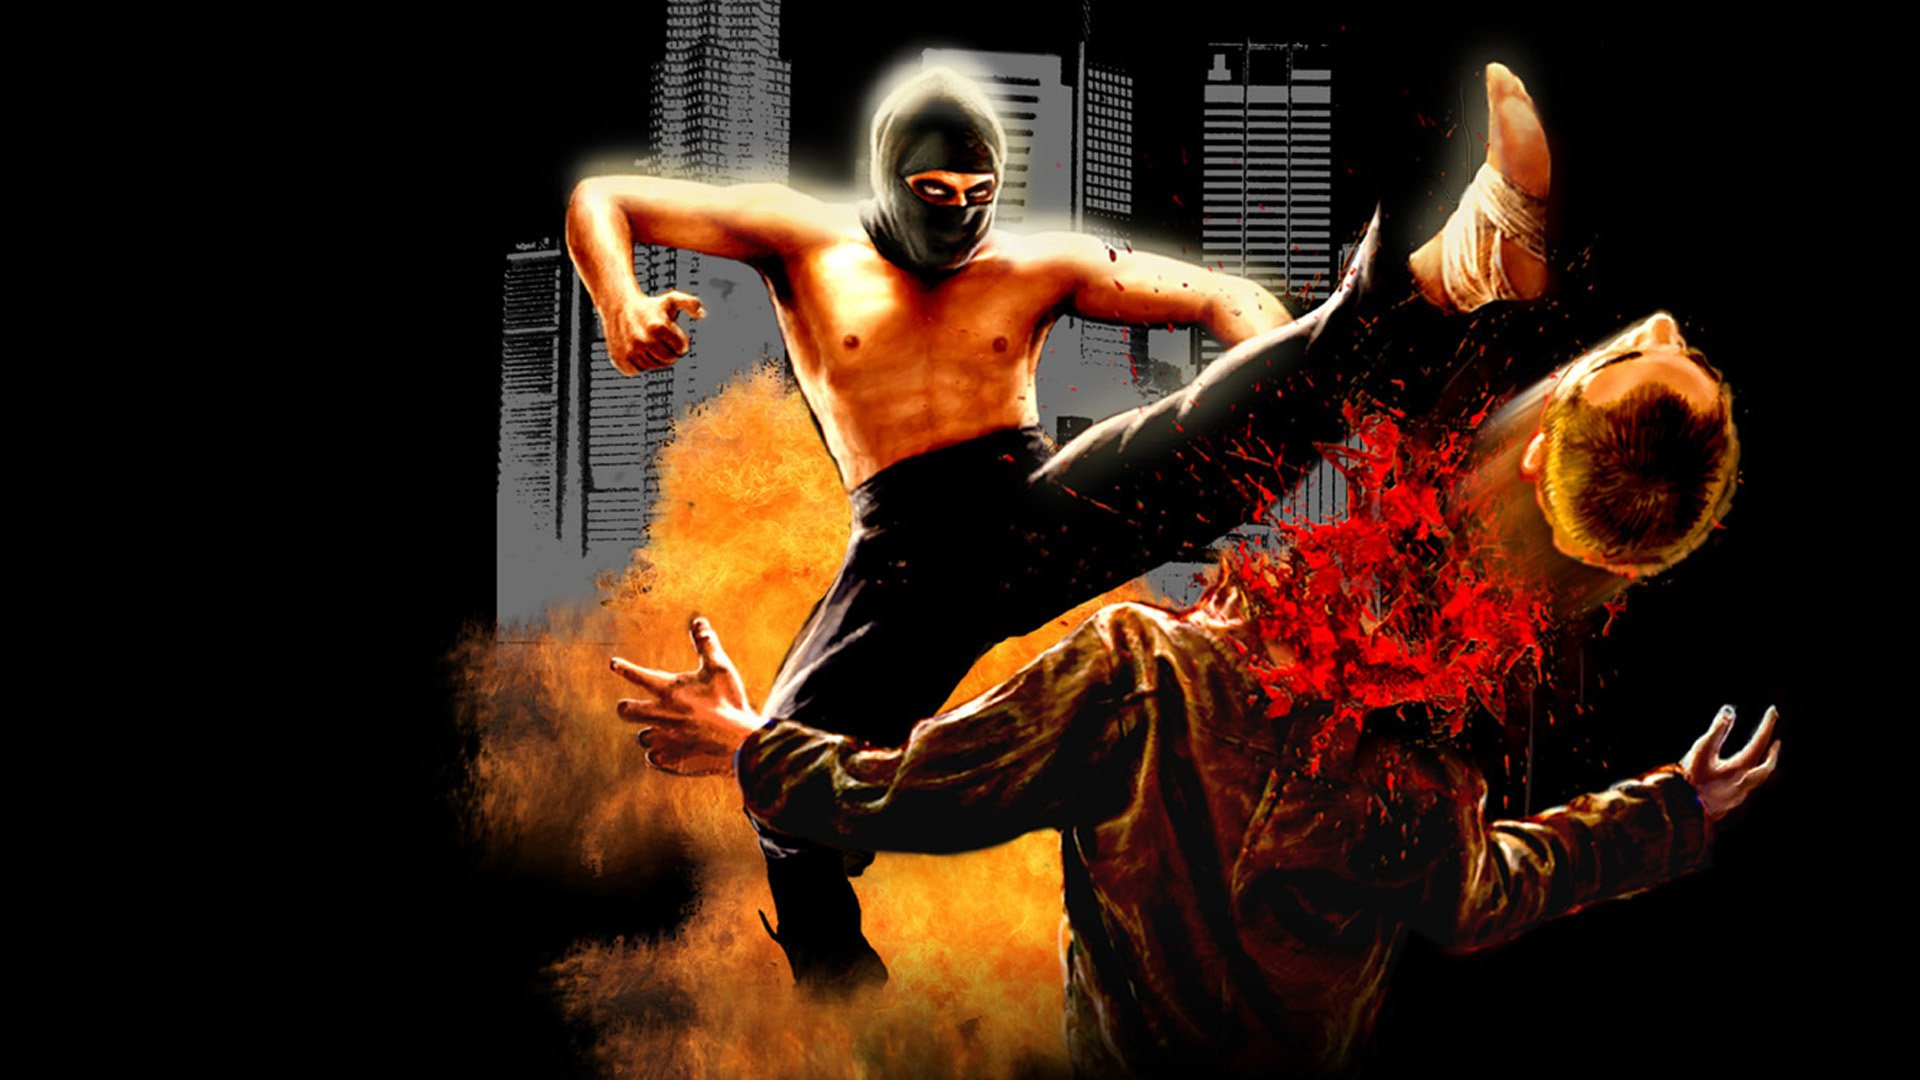 DARK ANGEL PSYCHO KICKBOXER martial arts fighting action dark 1920x1080